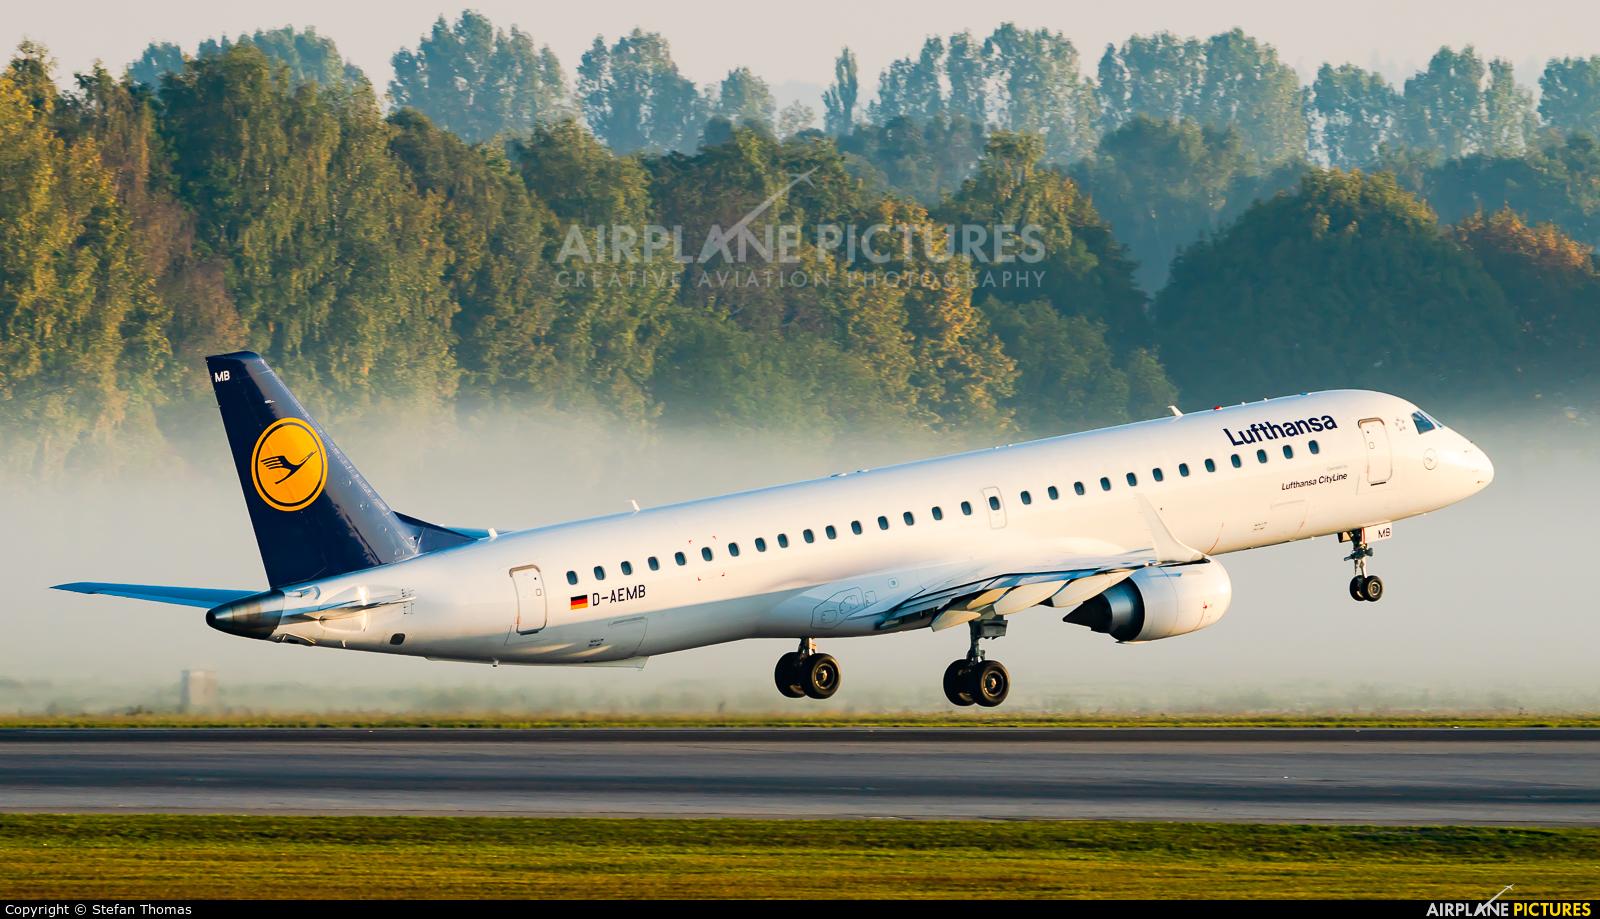 Lufthansa Regional - CityLine D-AEMB aircraft at Munich